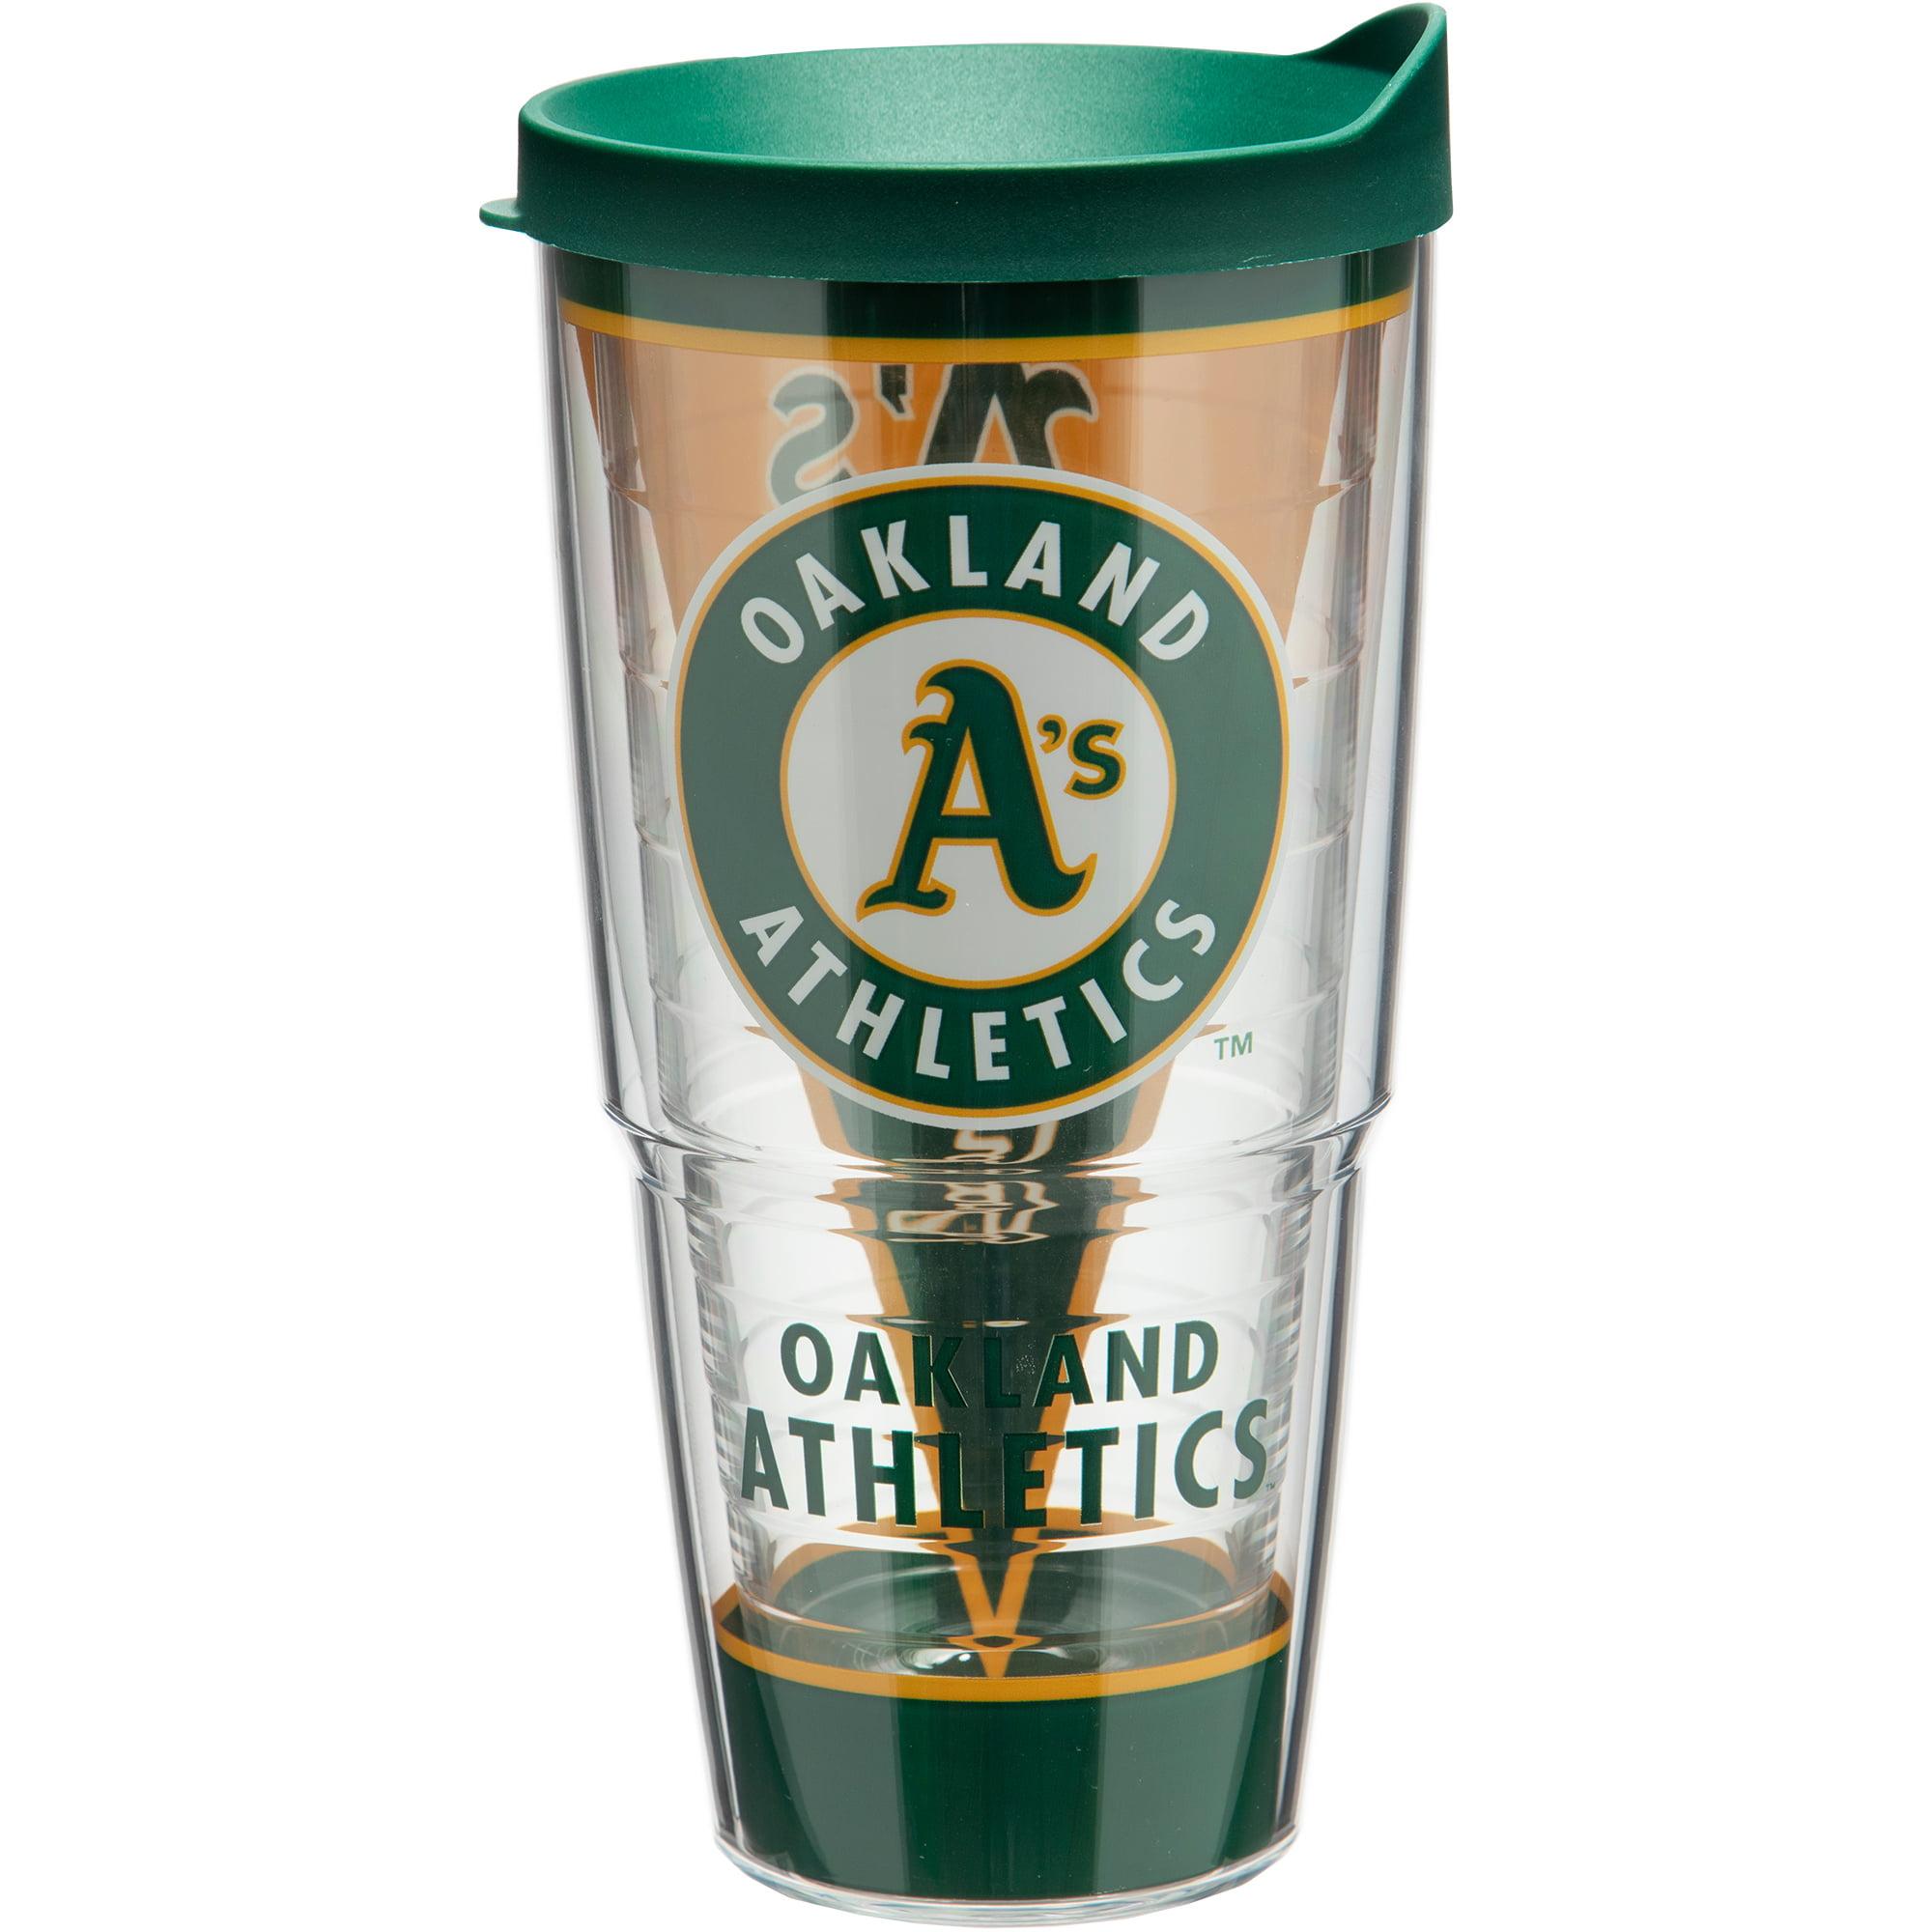 Oakland Athletics Tervis 24oz. Batter Up Acrylic Tumbler - No Size